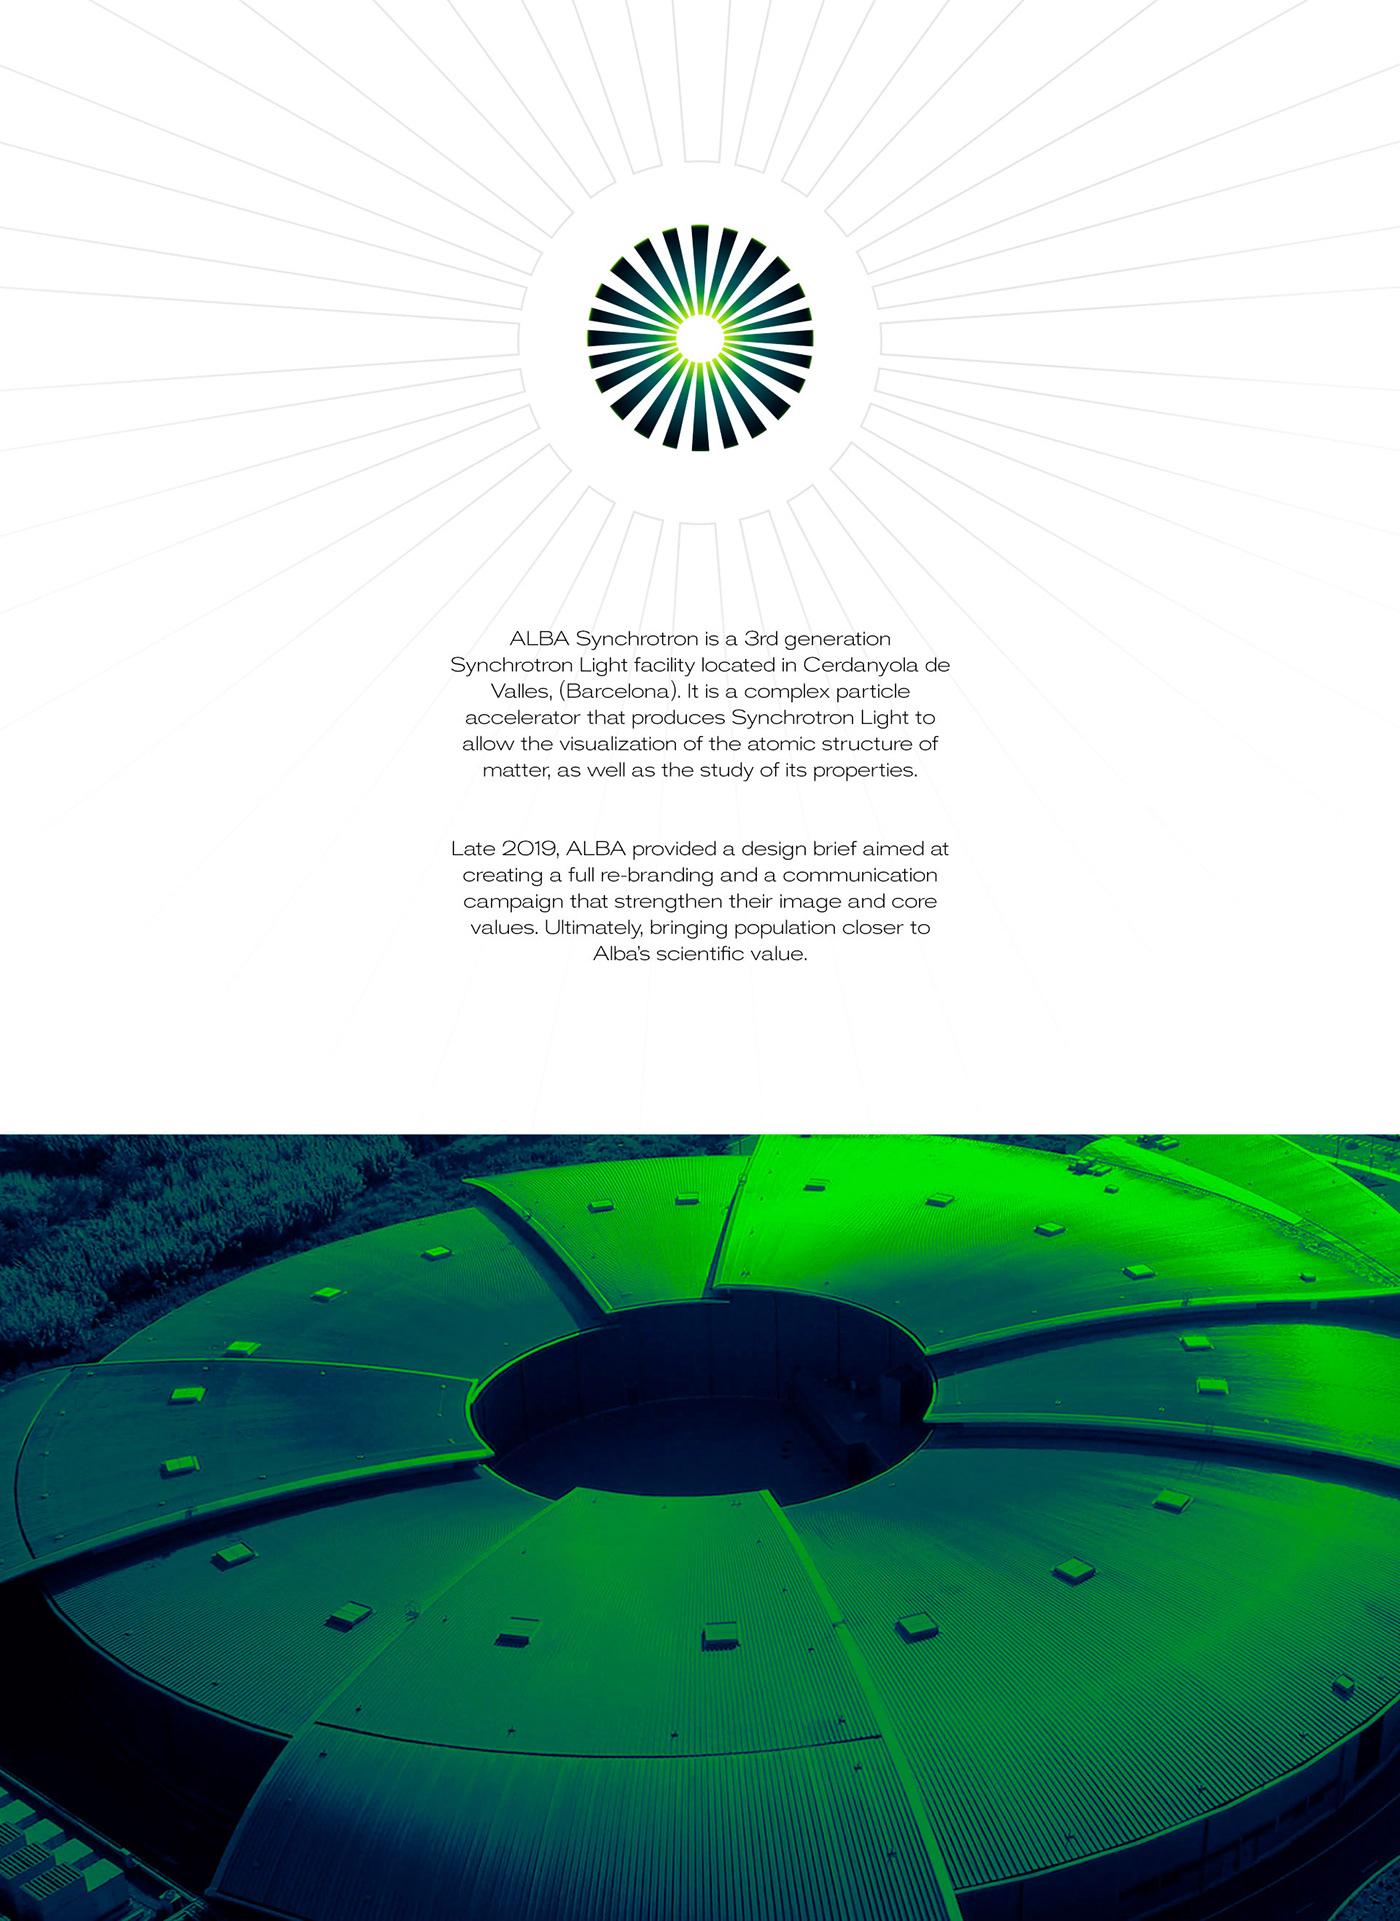 accelerator branding  communication graphicdesign light logo science spain synchrotron visual